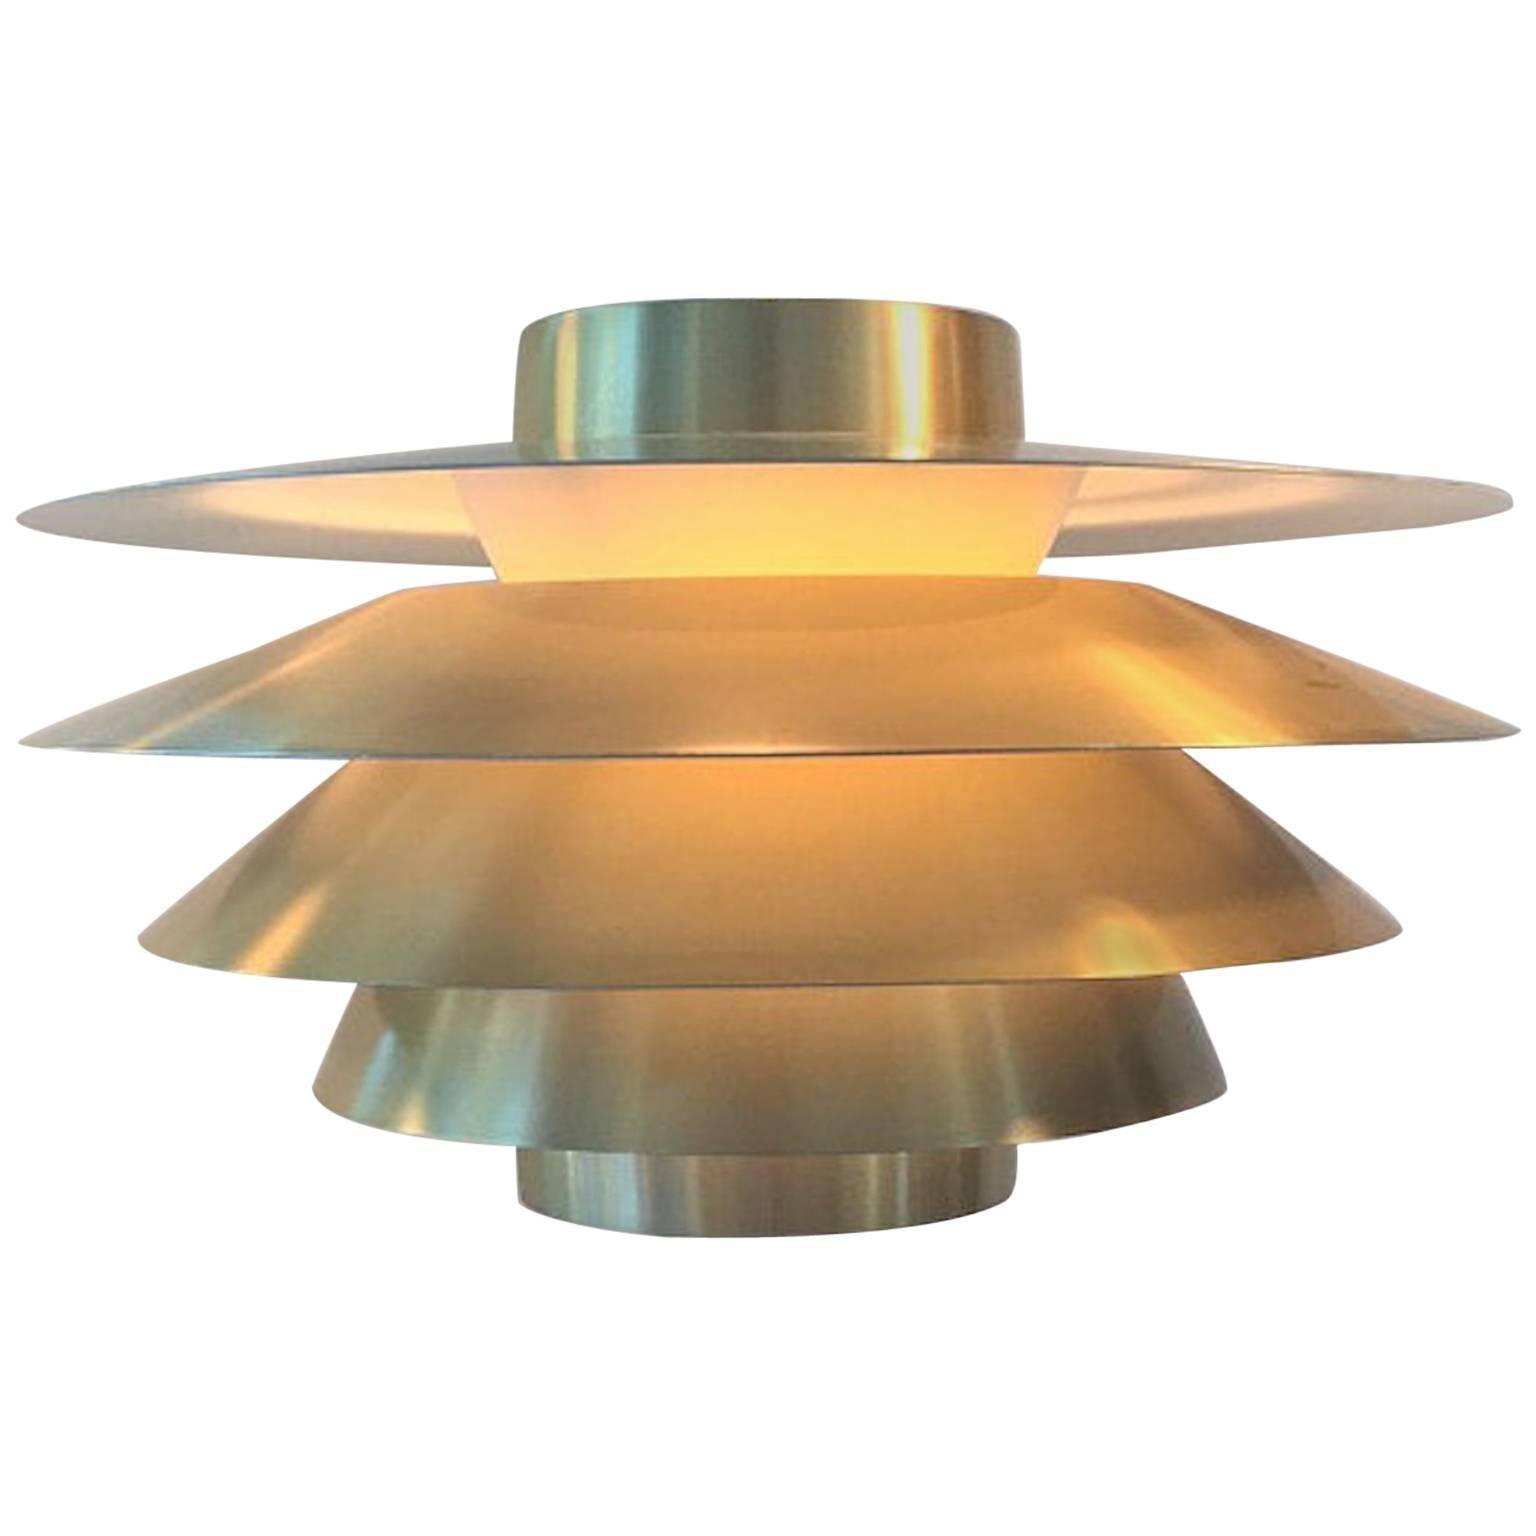 "Classic Danish Brass Pendant ""Verona"" by Svend Middelboe for Nordisk Solar"